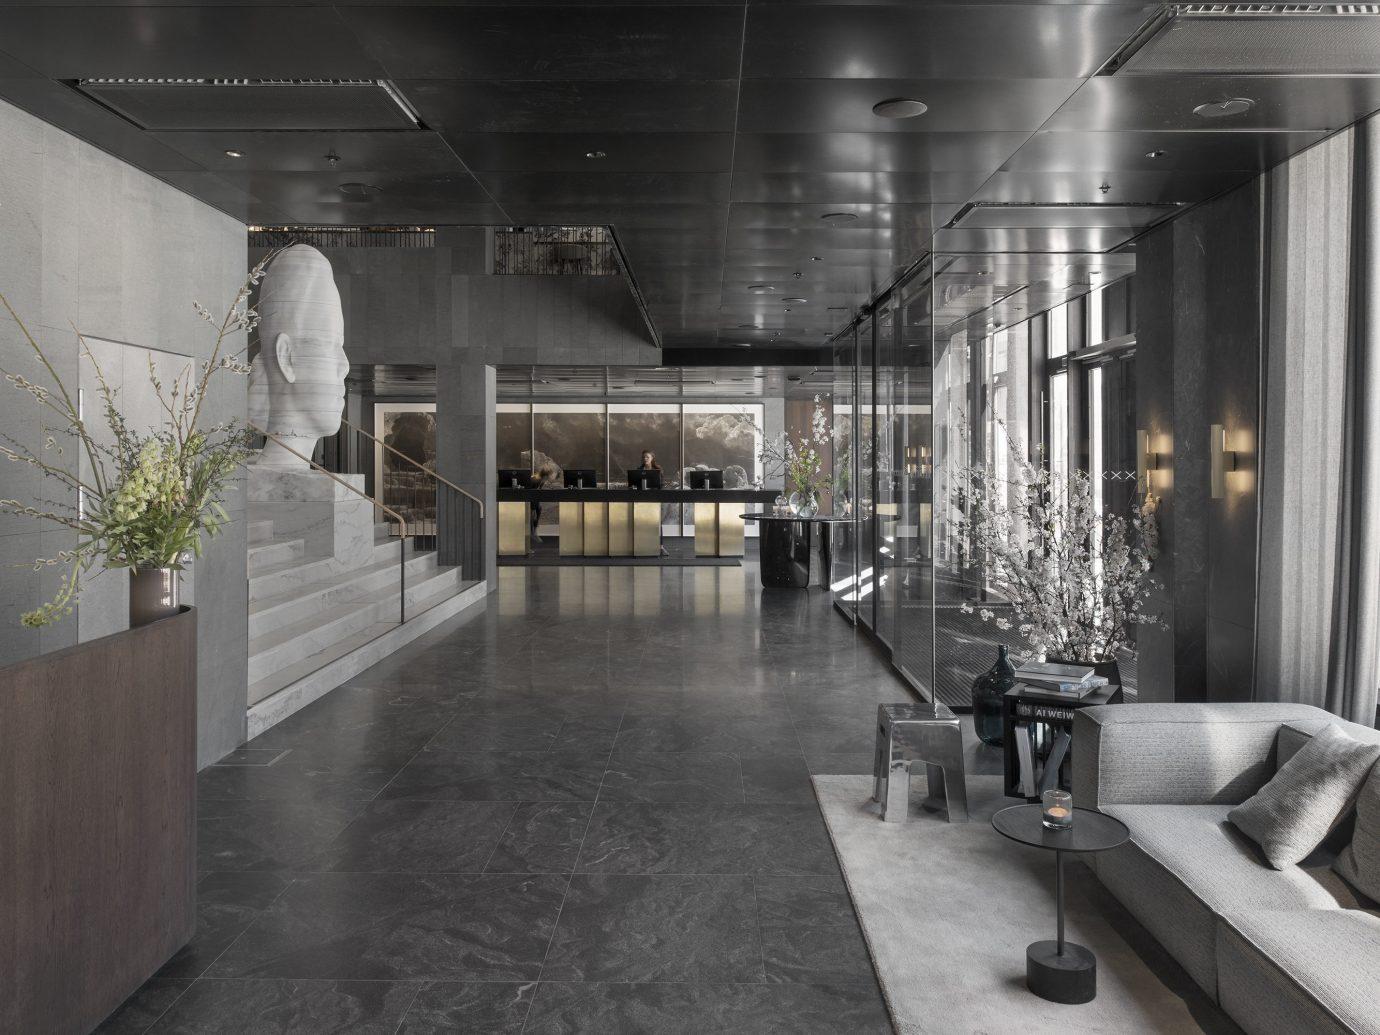 Hotels Stockholm Sweden indoor floor ceiling interior design Lobby room flooring loft furniture